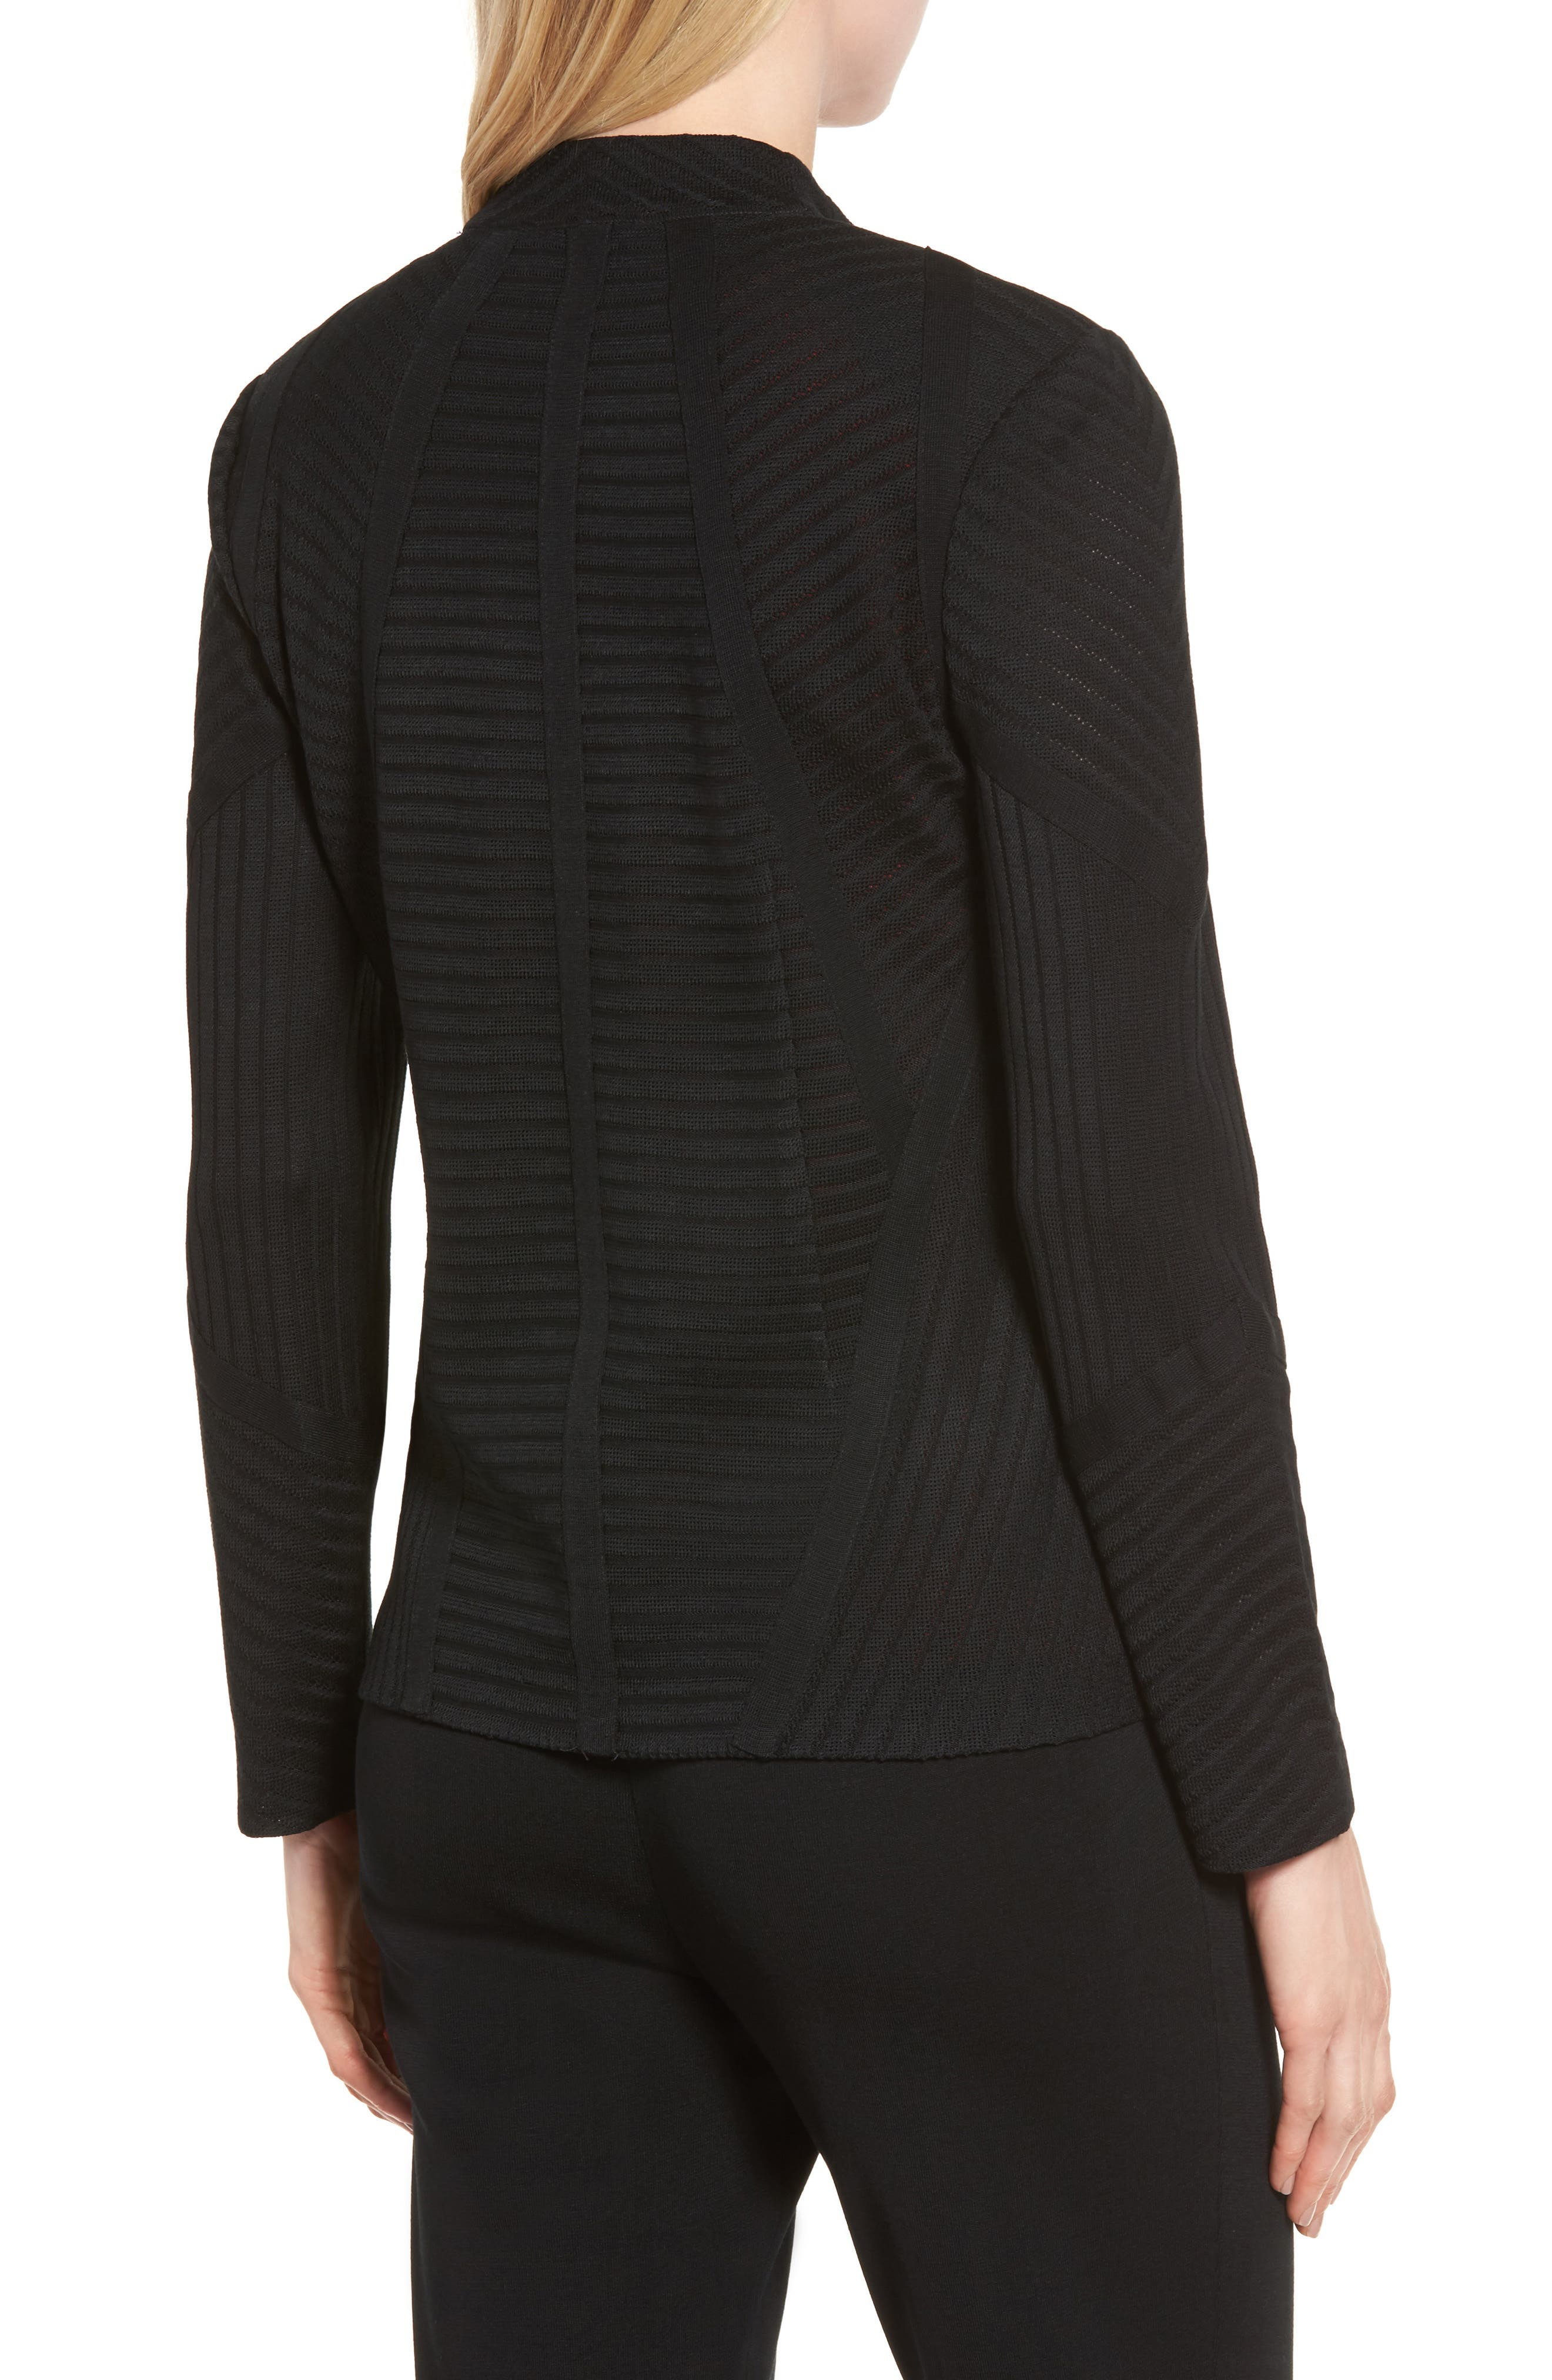 Striped Knit Jacket,                             Alternate thumbnail 2, color,                             Black